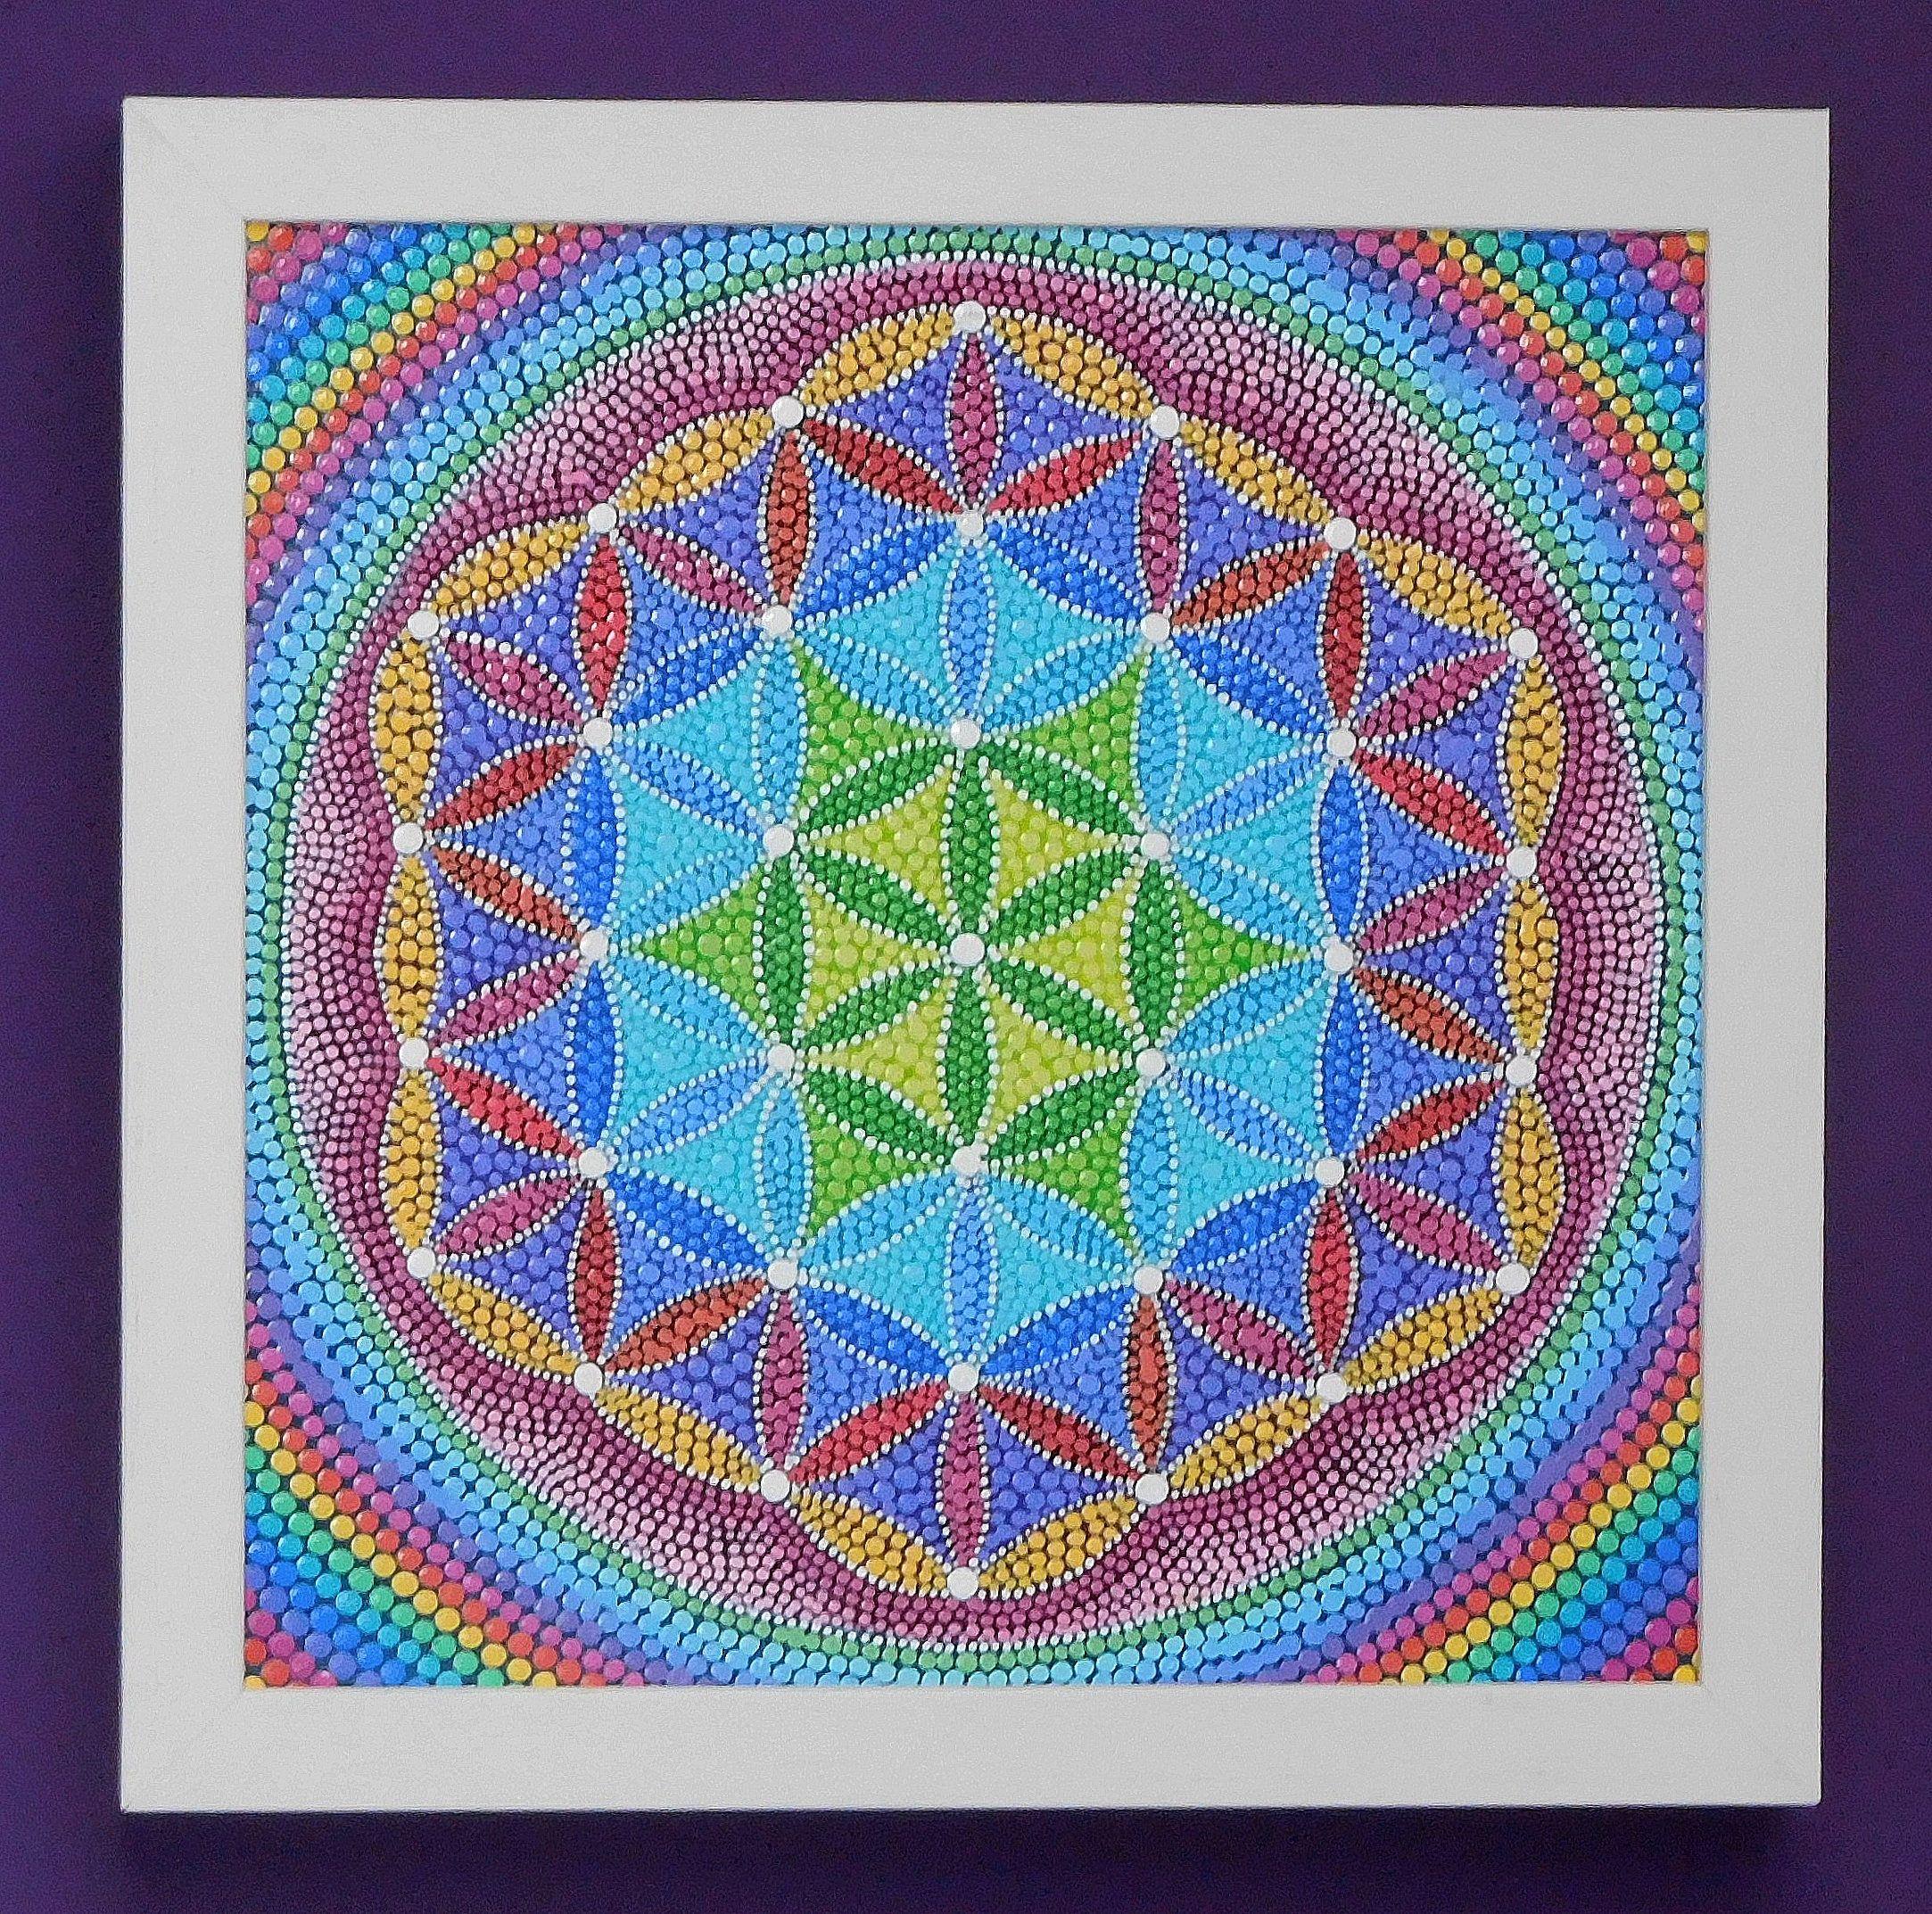 Flower of Life  - Dot Mandala Painting -  Dotillism - 27.5cm x 27.5cm - depth 3.4cm - Off-White wooden frame - painting by Katharine Moore by StripeyCatsStudio on Etsy